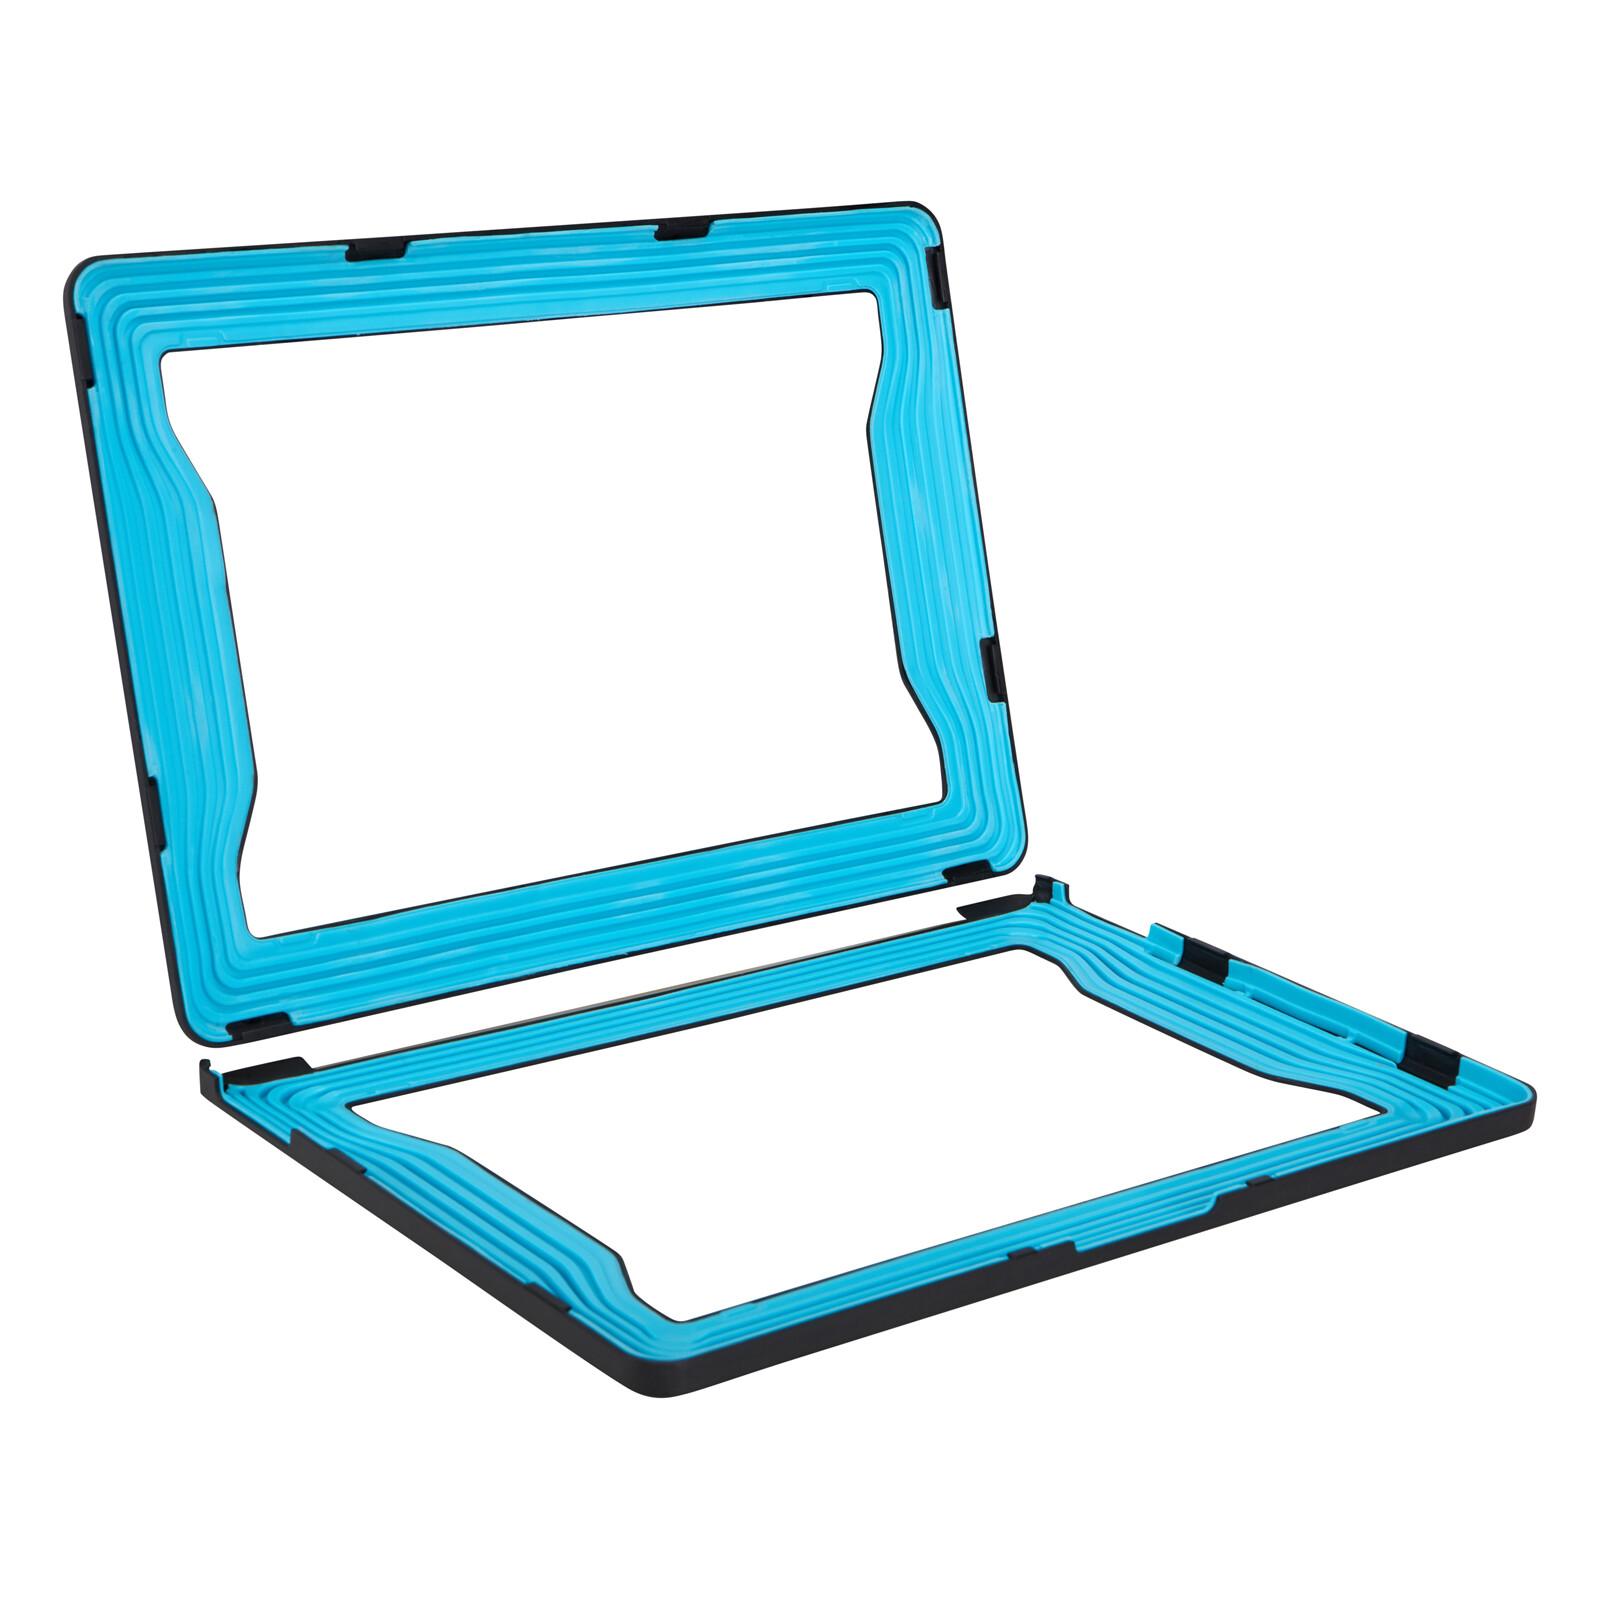 "Thule Vectros Bumper 13"" MacBook Pro"